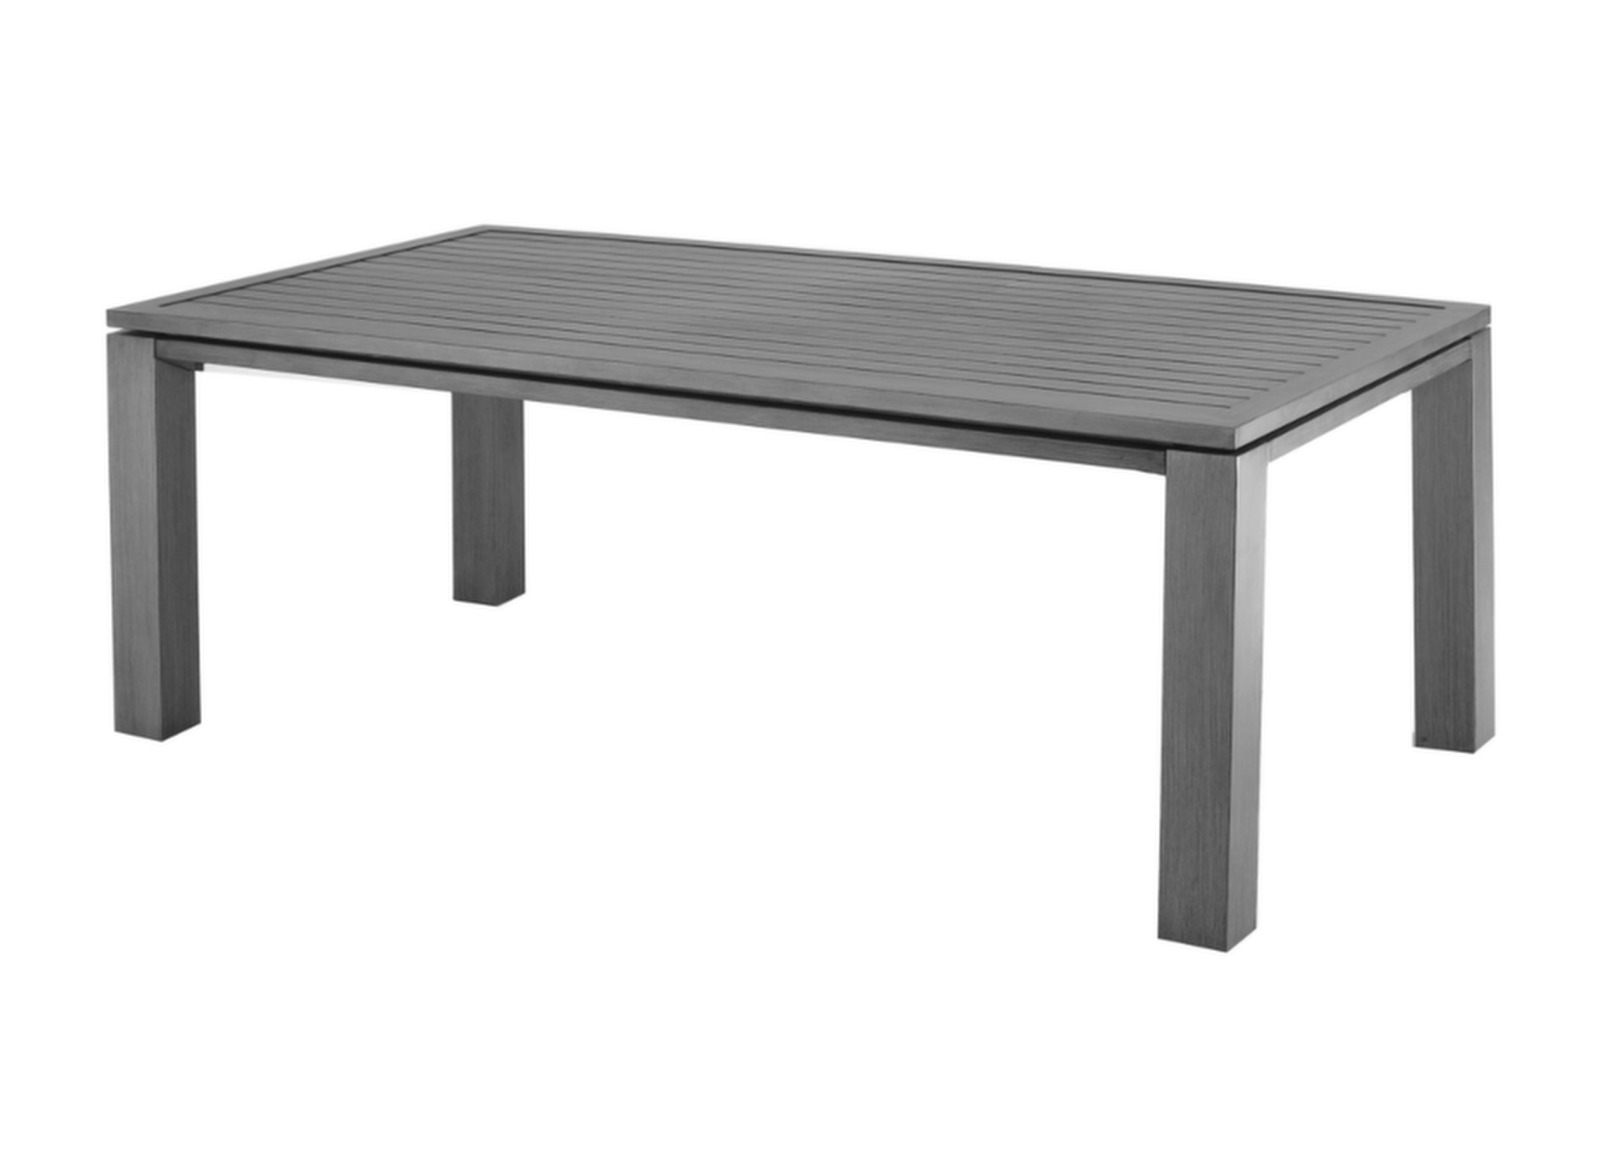 Table Fiero 240 cm + 8 chaises Antibes